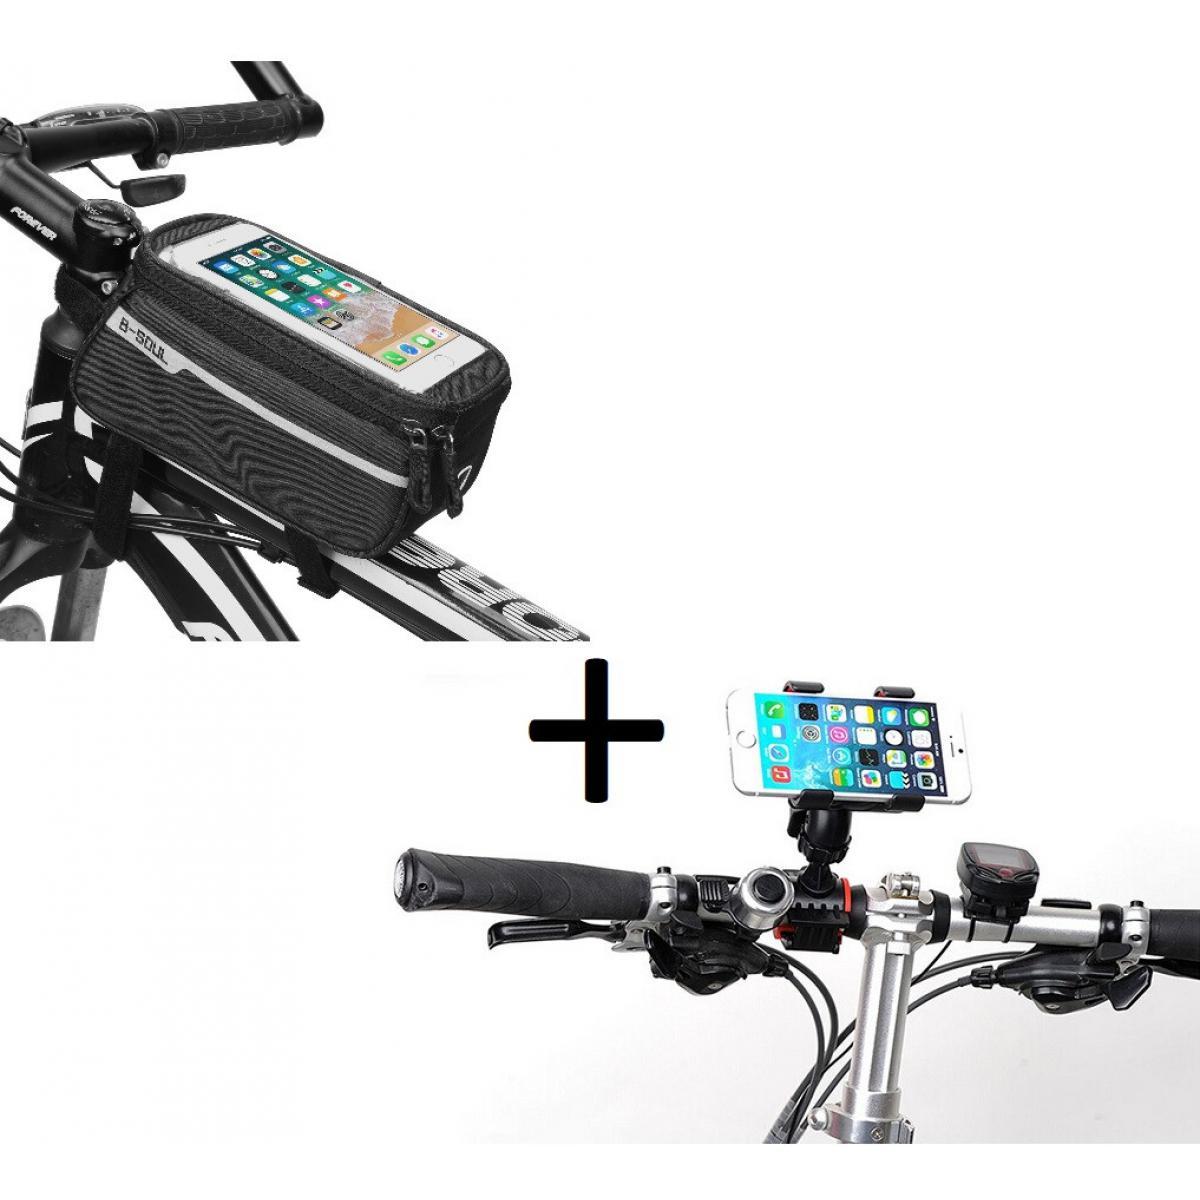 Shot Pack Velo pour OPPO Find X2 Pro Smartphone (Support Velo Guidon + Pochette Tactile) VTT Cyclisme (NOIR)